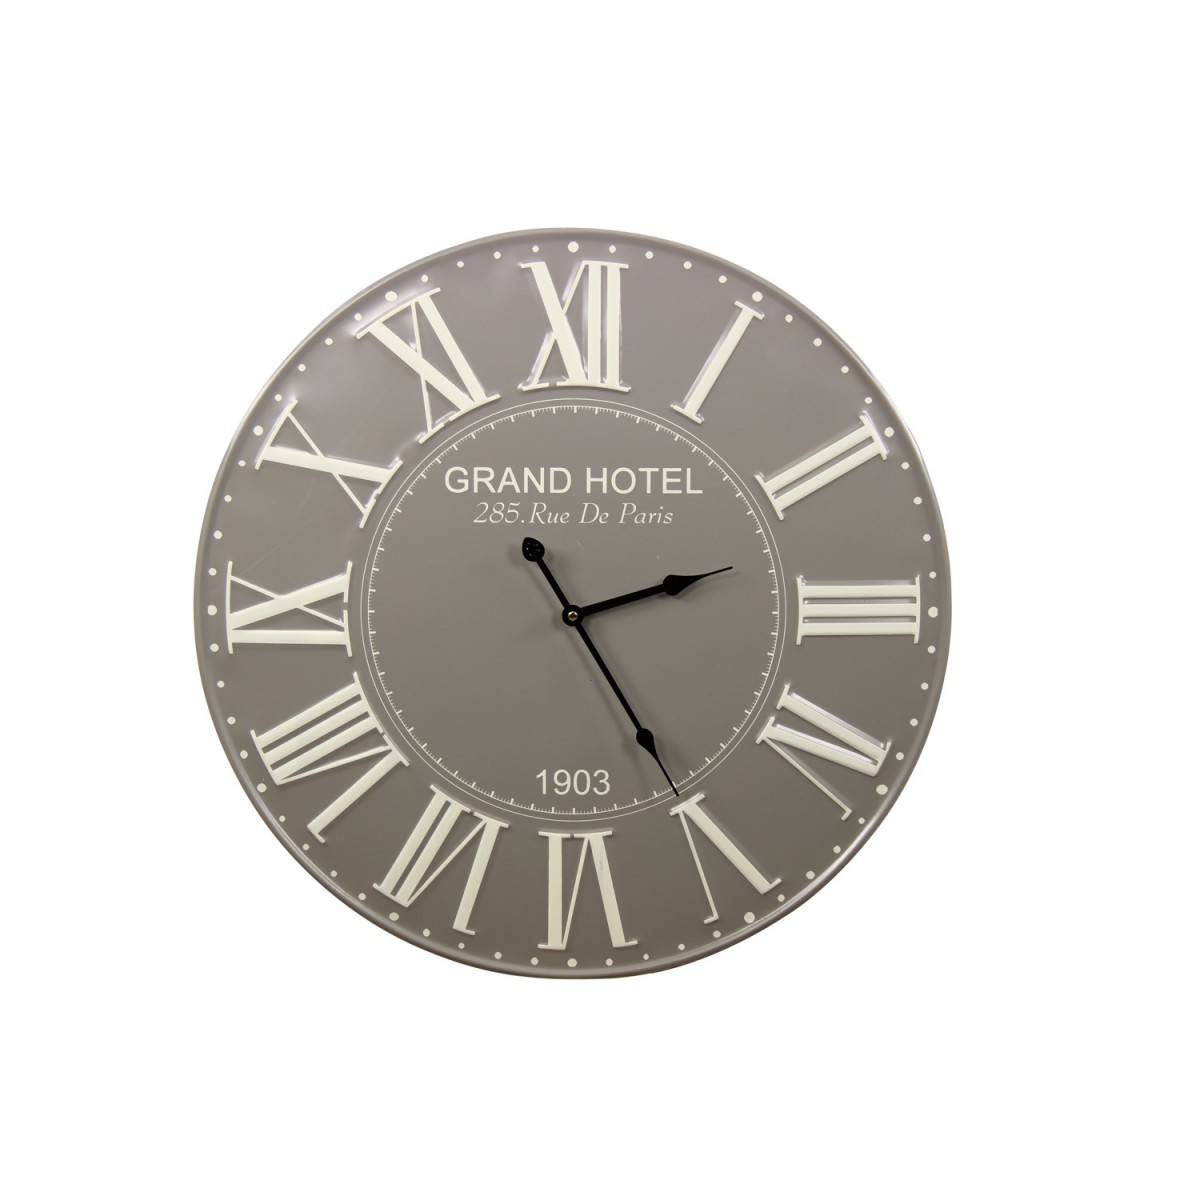 Horloge Ancienne Metal Grand Hotel 58cm - Métal - Gris